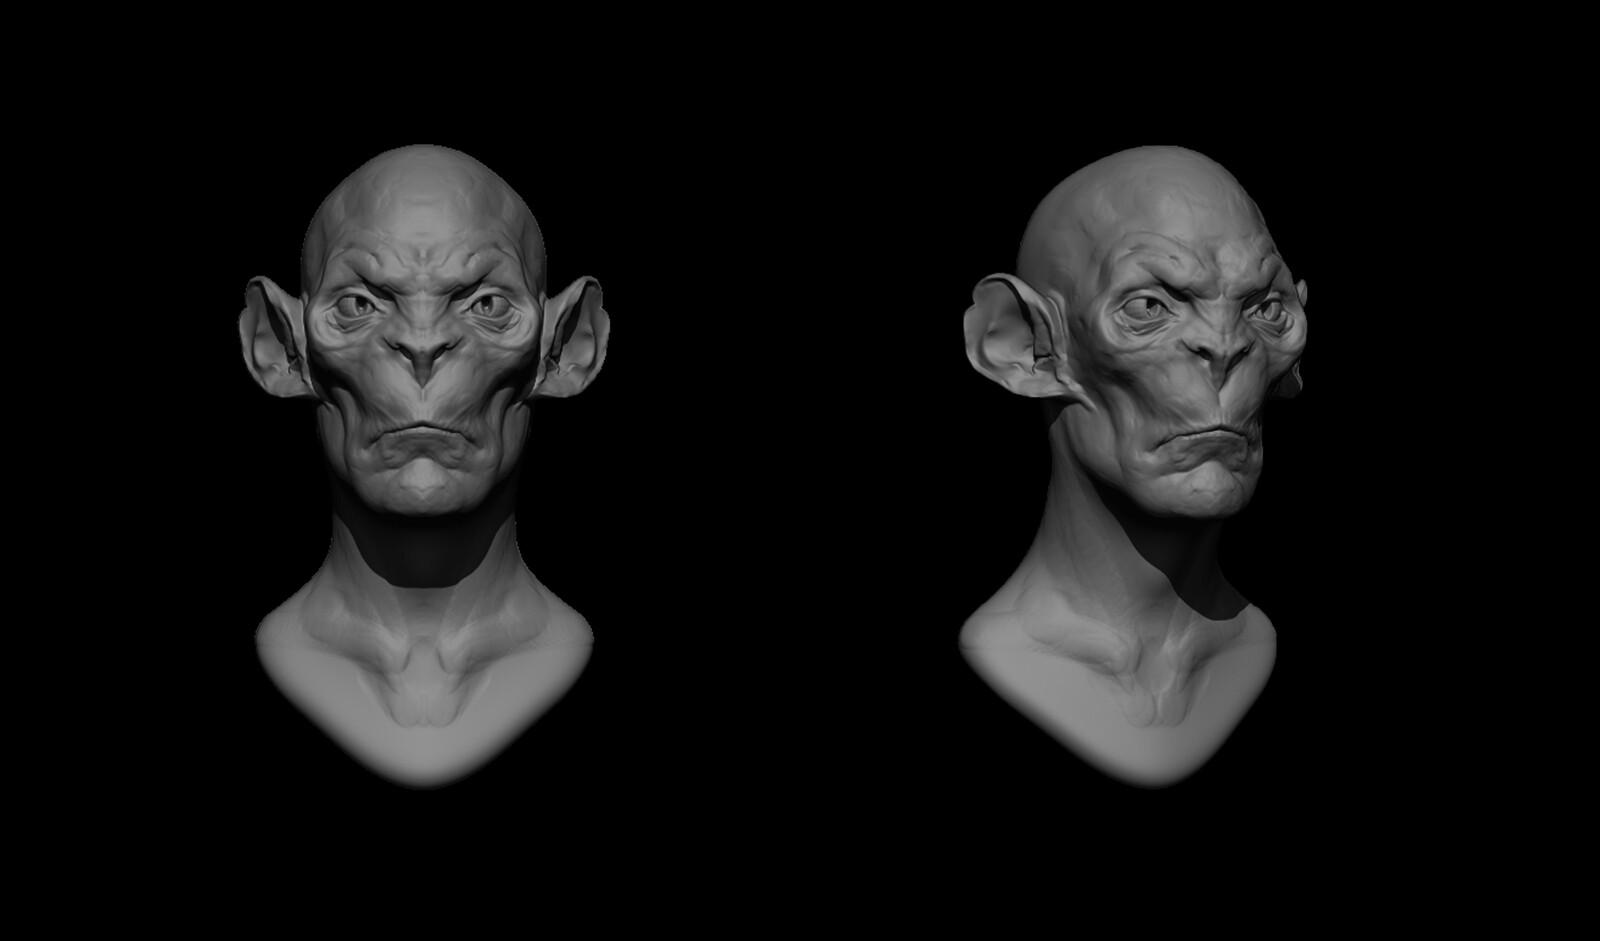 Concept: Head